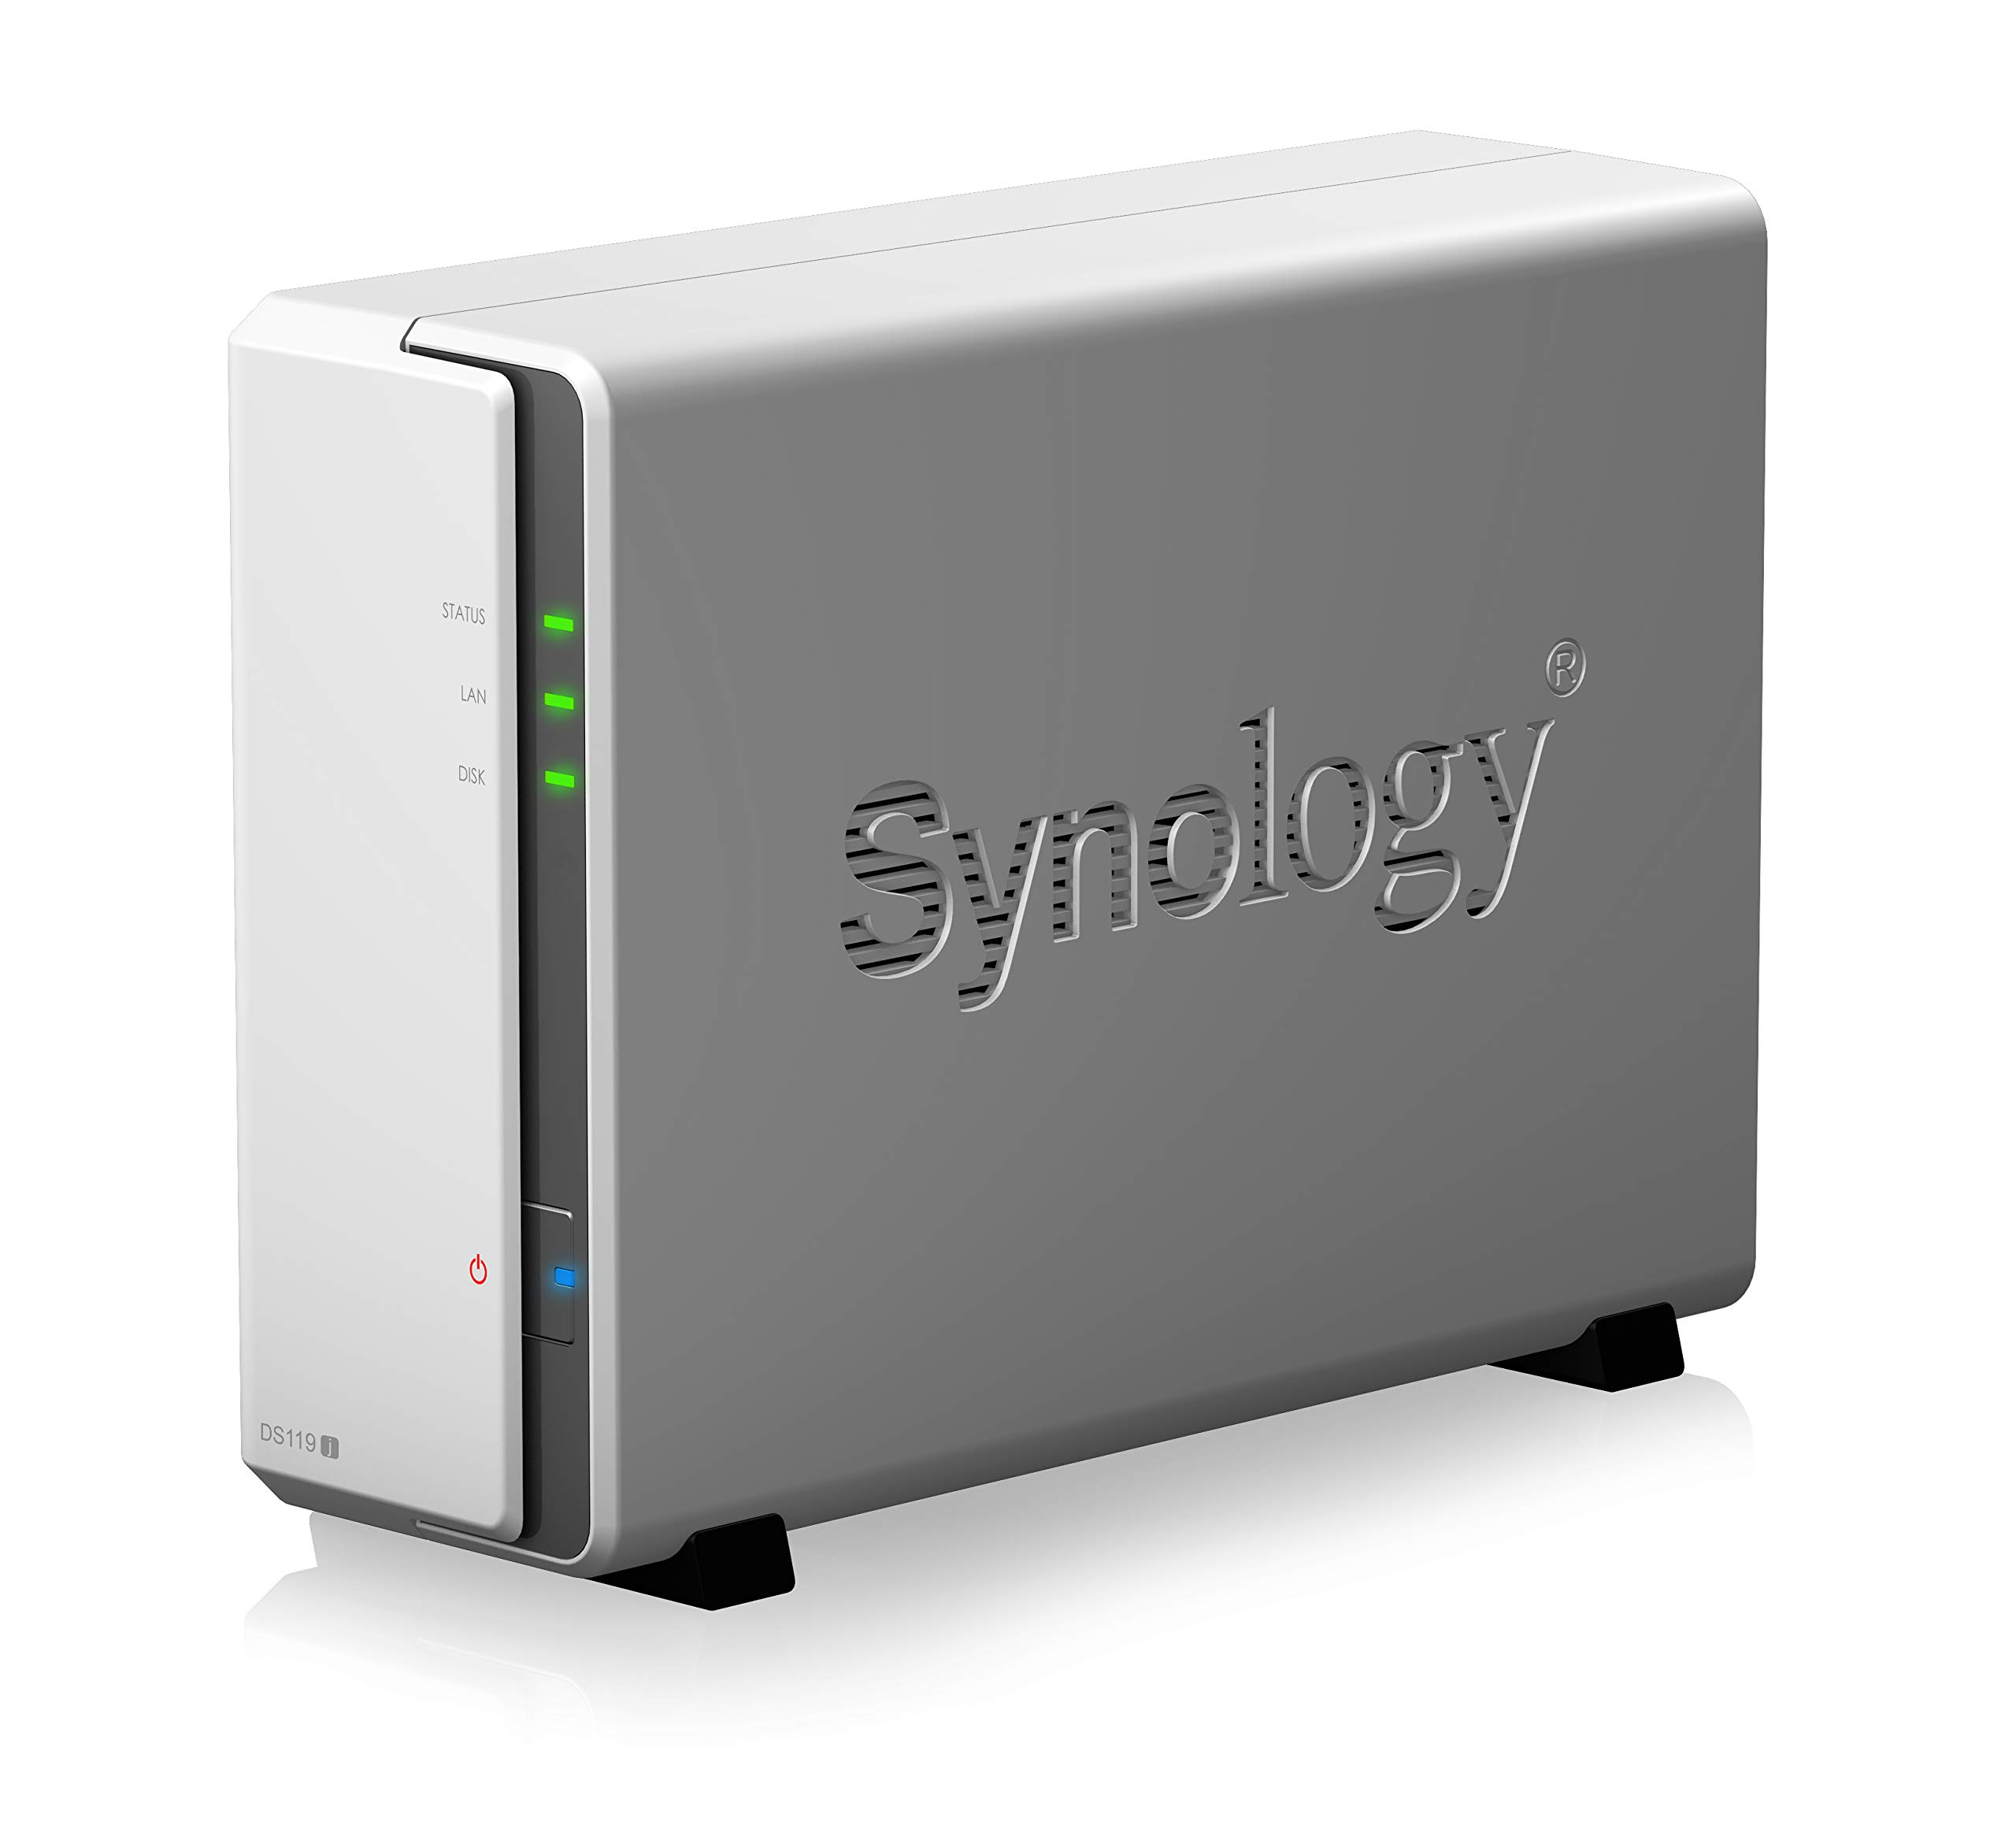 Synology 1 Bay NAS DiskStation (DS119j), 1-Bay; 256MB DDR3L by Synology (Image #6)